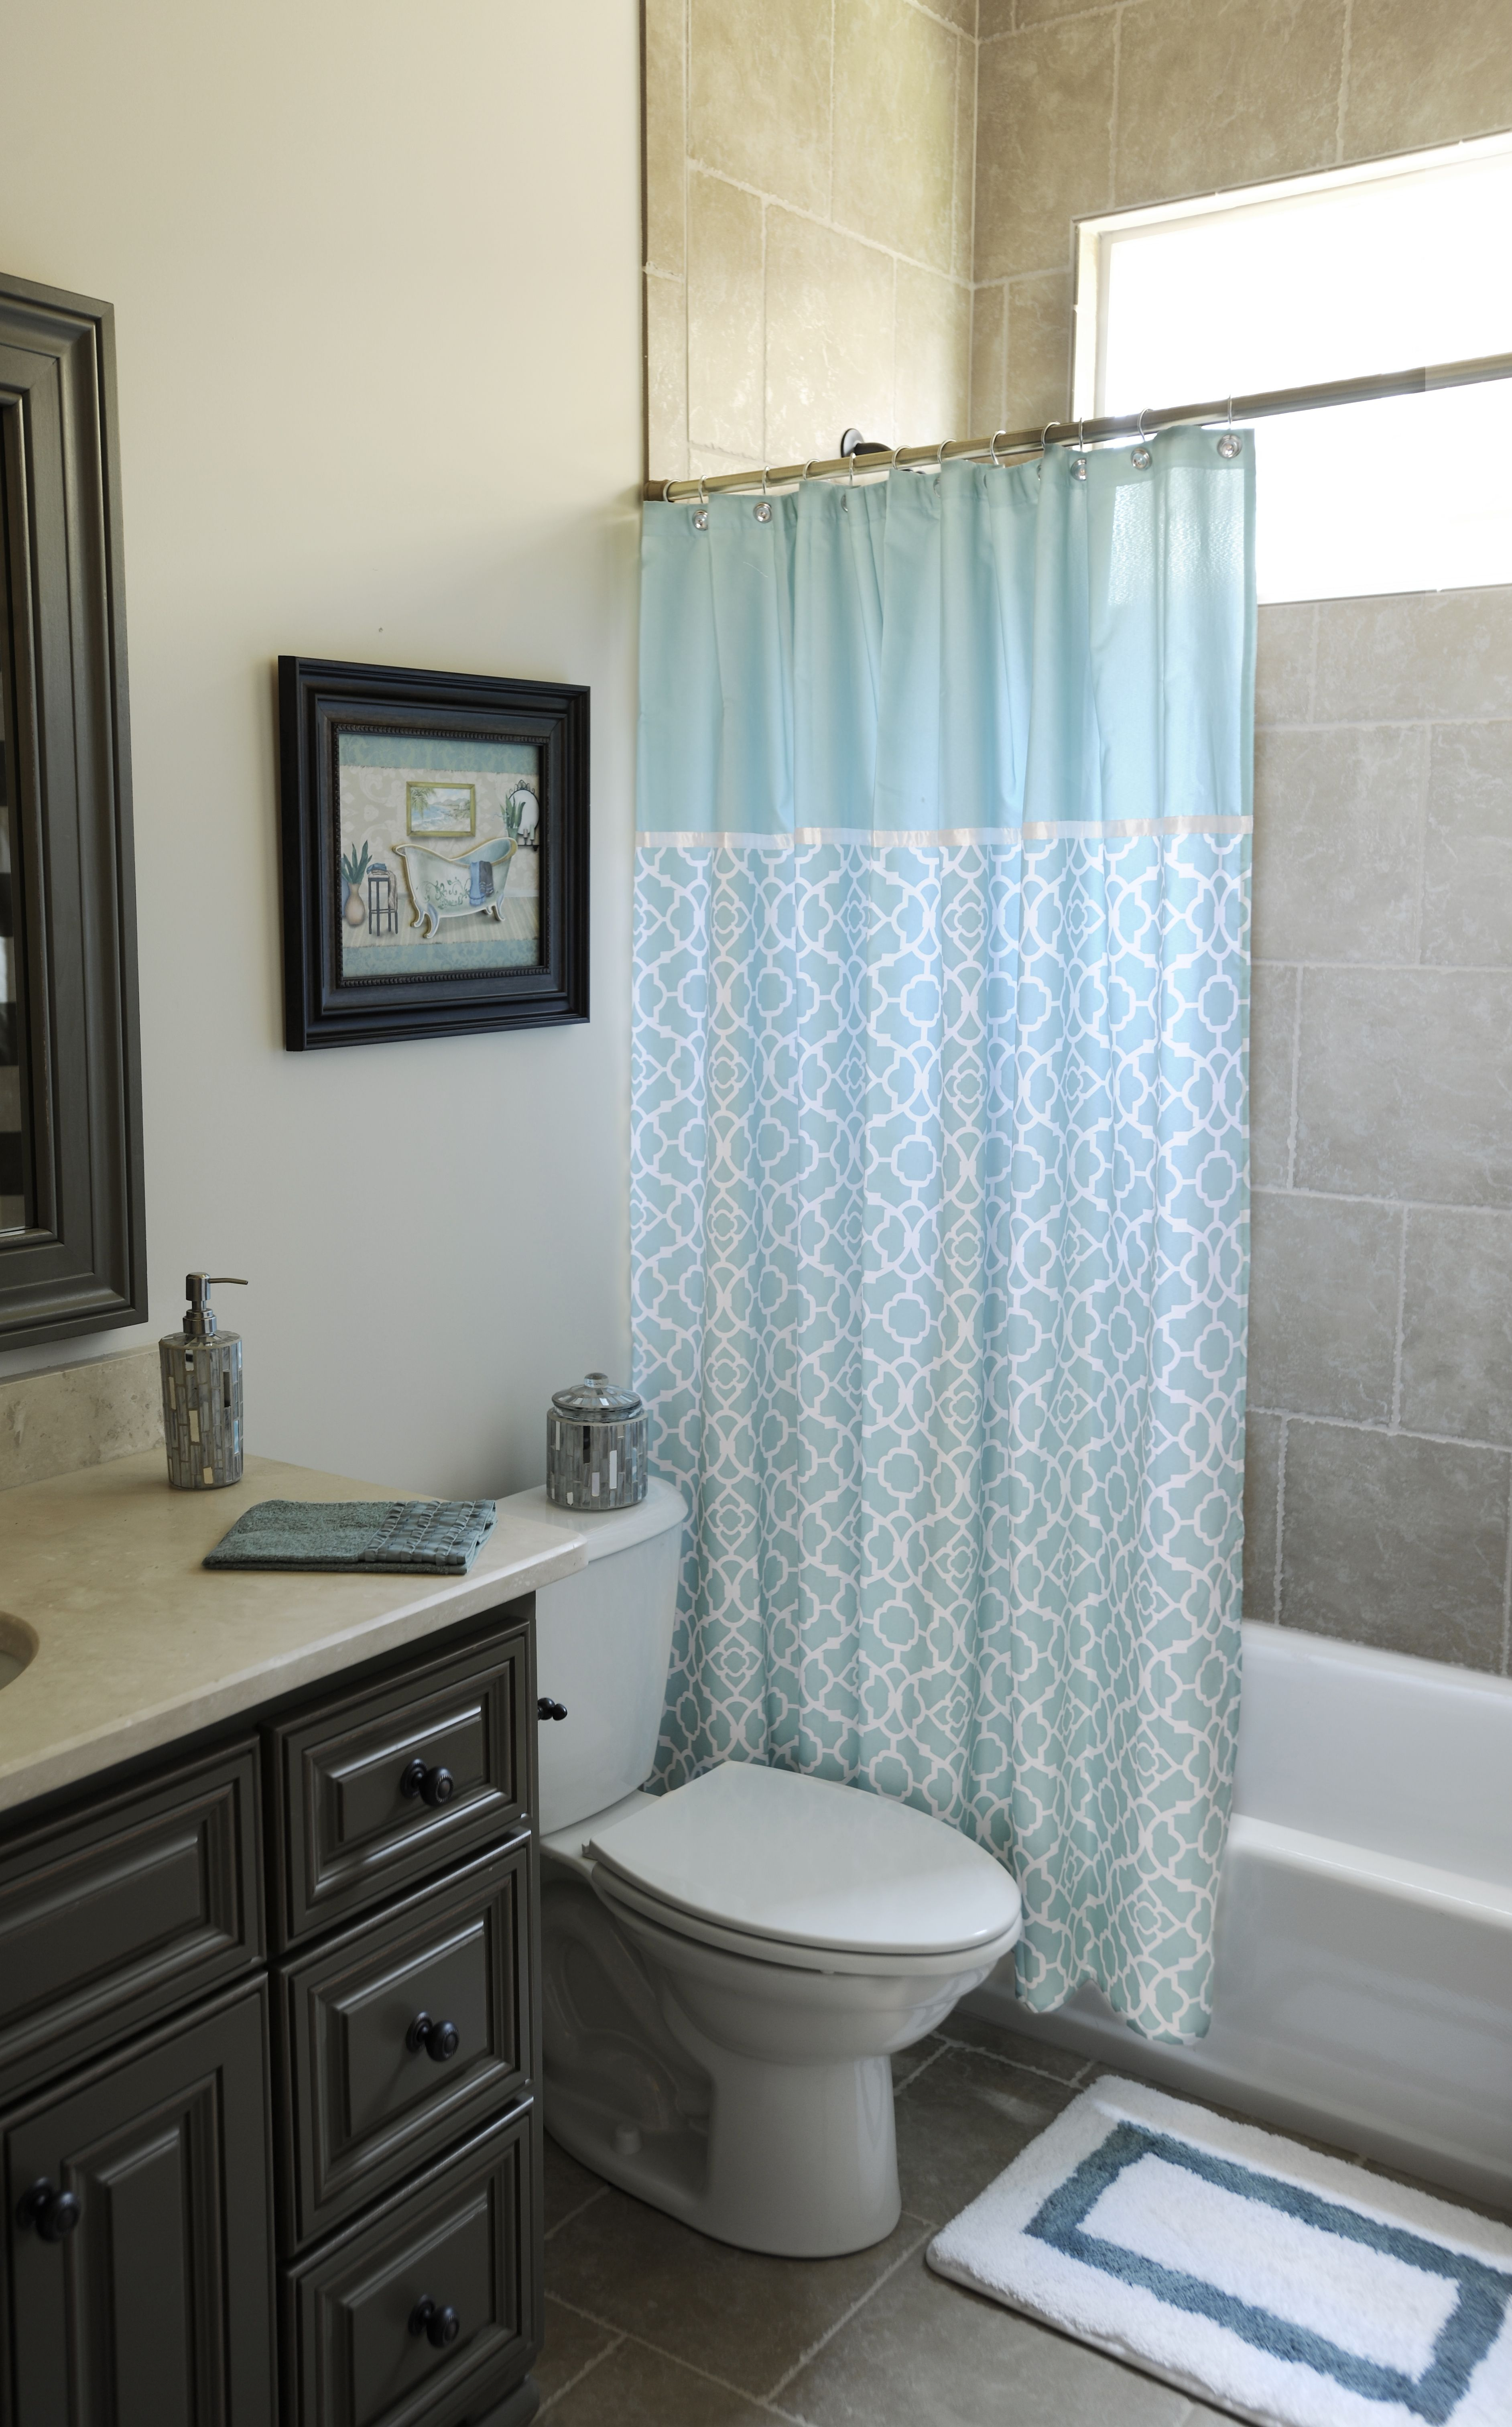 Cool Blue Kirklands Bathroomluxury This Shower Curtain For Reeds Bathroom Restroom Decor Small Bathroom Remodel Bathroom Decor Colors